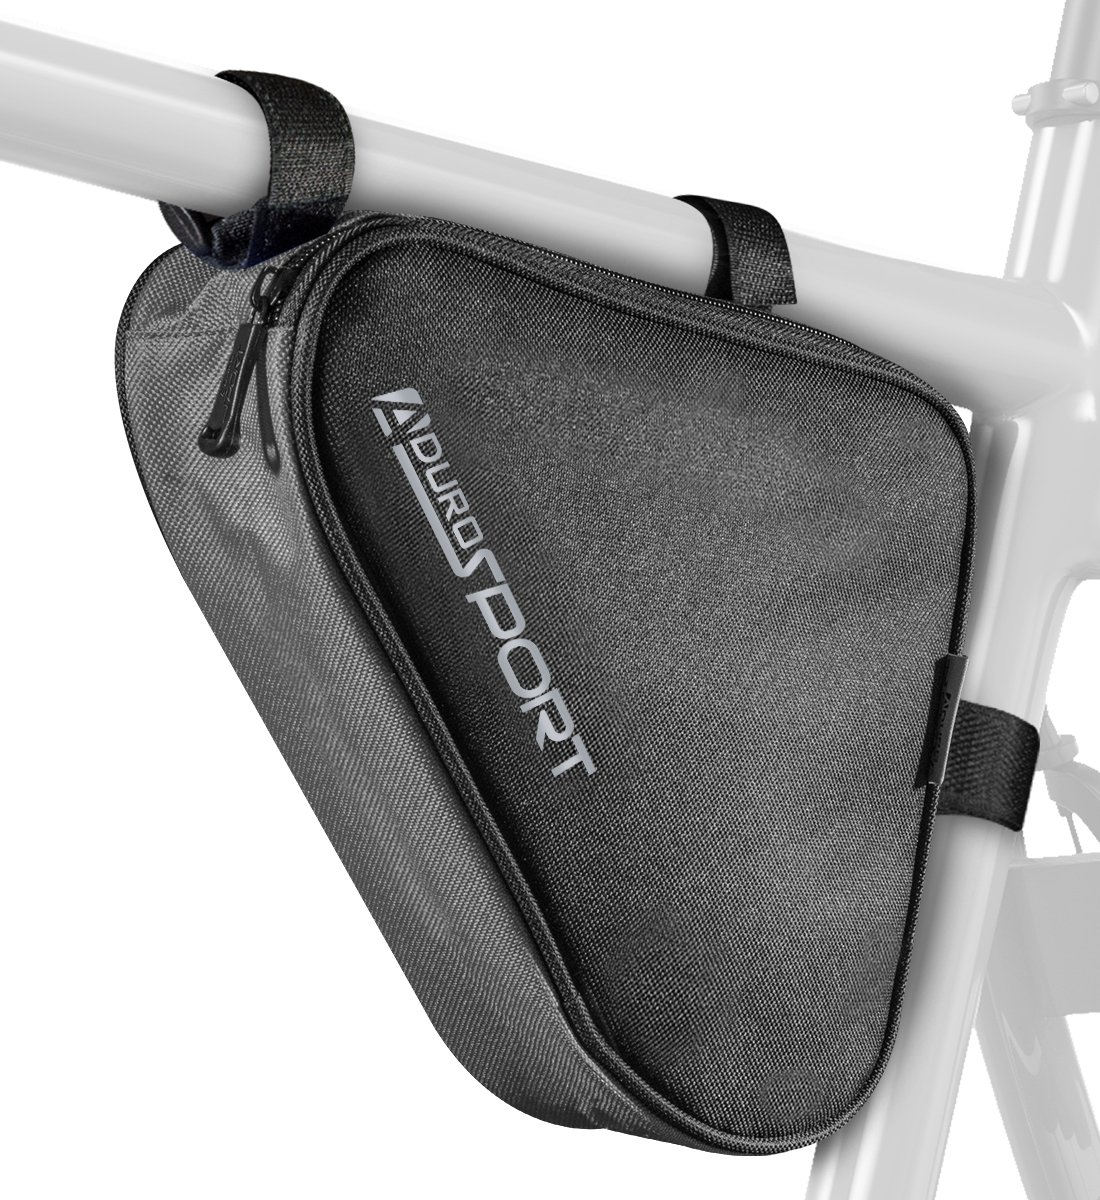 Aduro Sport Bicycle Bike Storage Bag Triangle Saddle Frame Pouch for Cycling (Grey)